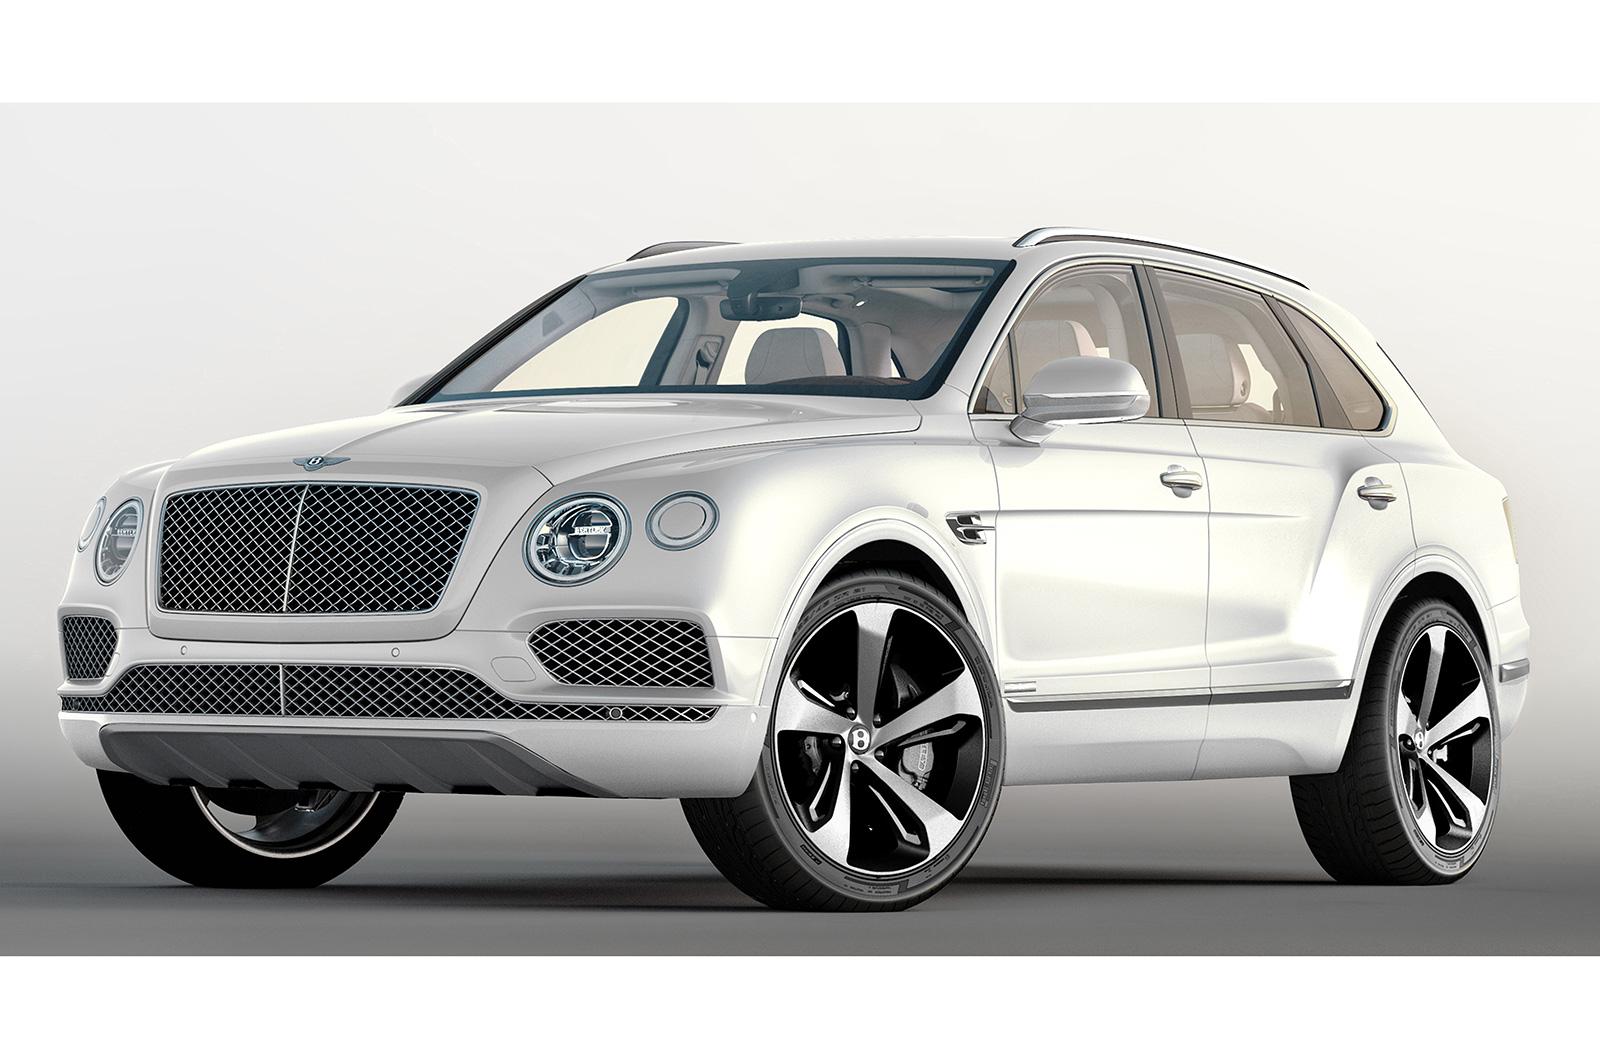 Bentley Bentayga First Edition Revealed Ahead Of La Motor Show Autocar